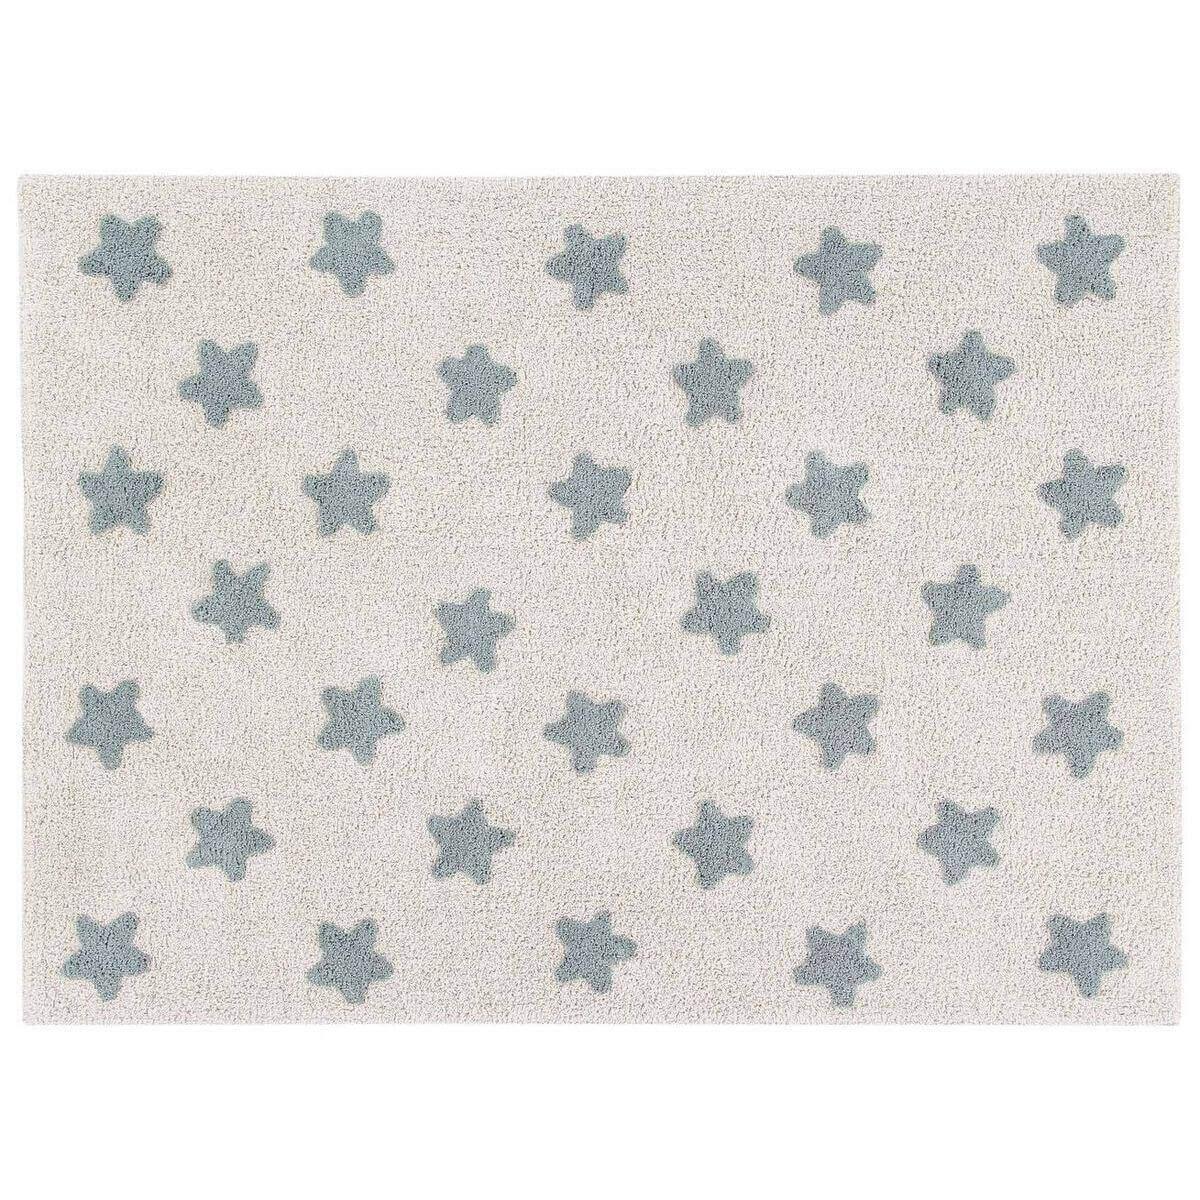 Tapis 120x160cm STARS Lorena Canals Natura-Azul Vintage